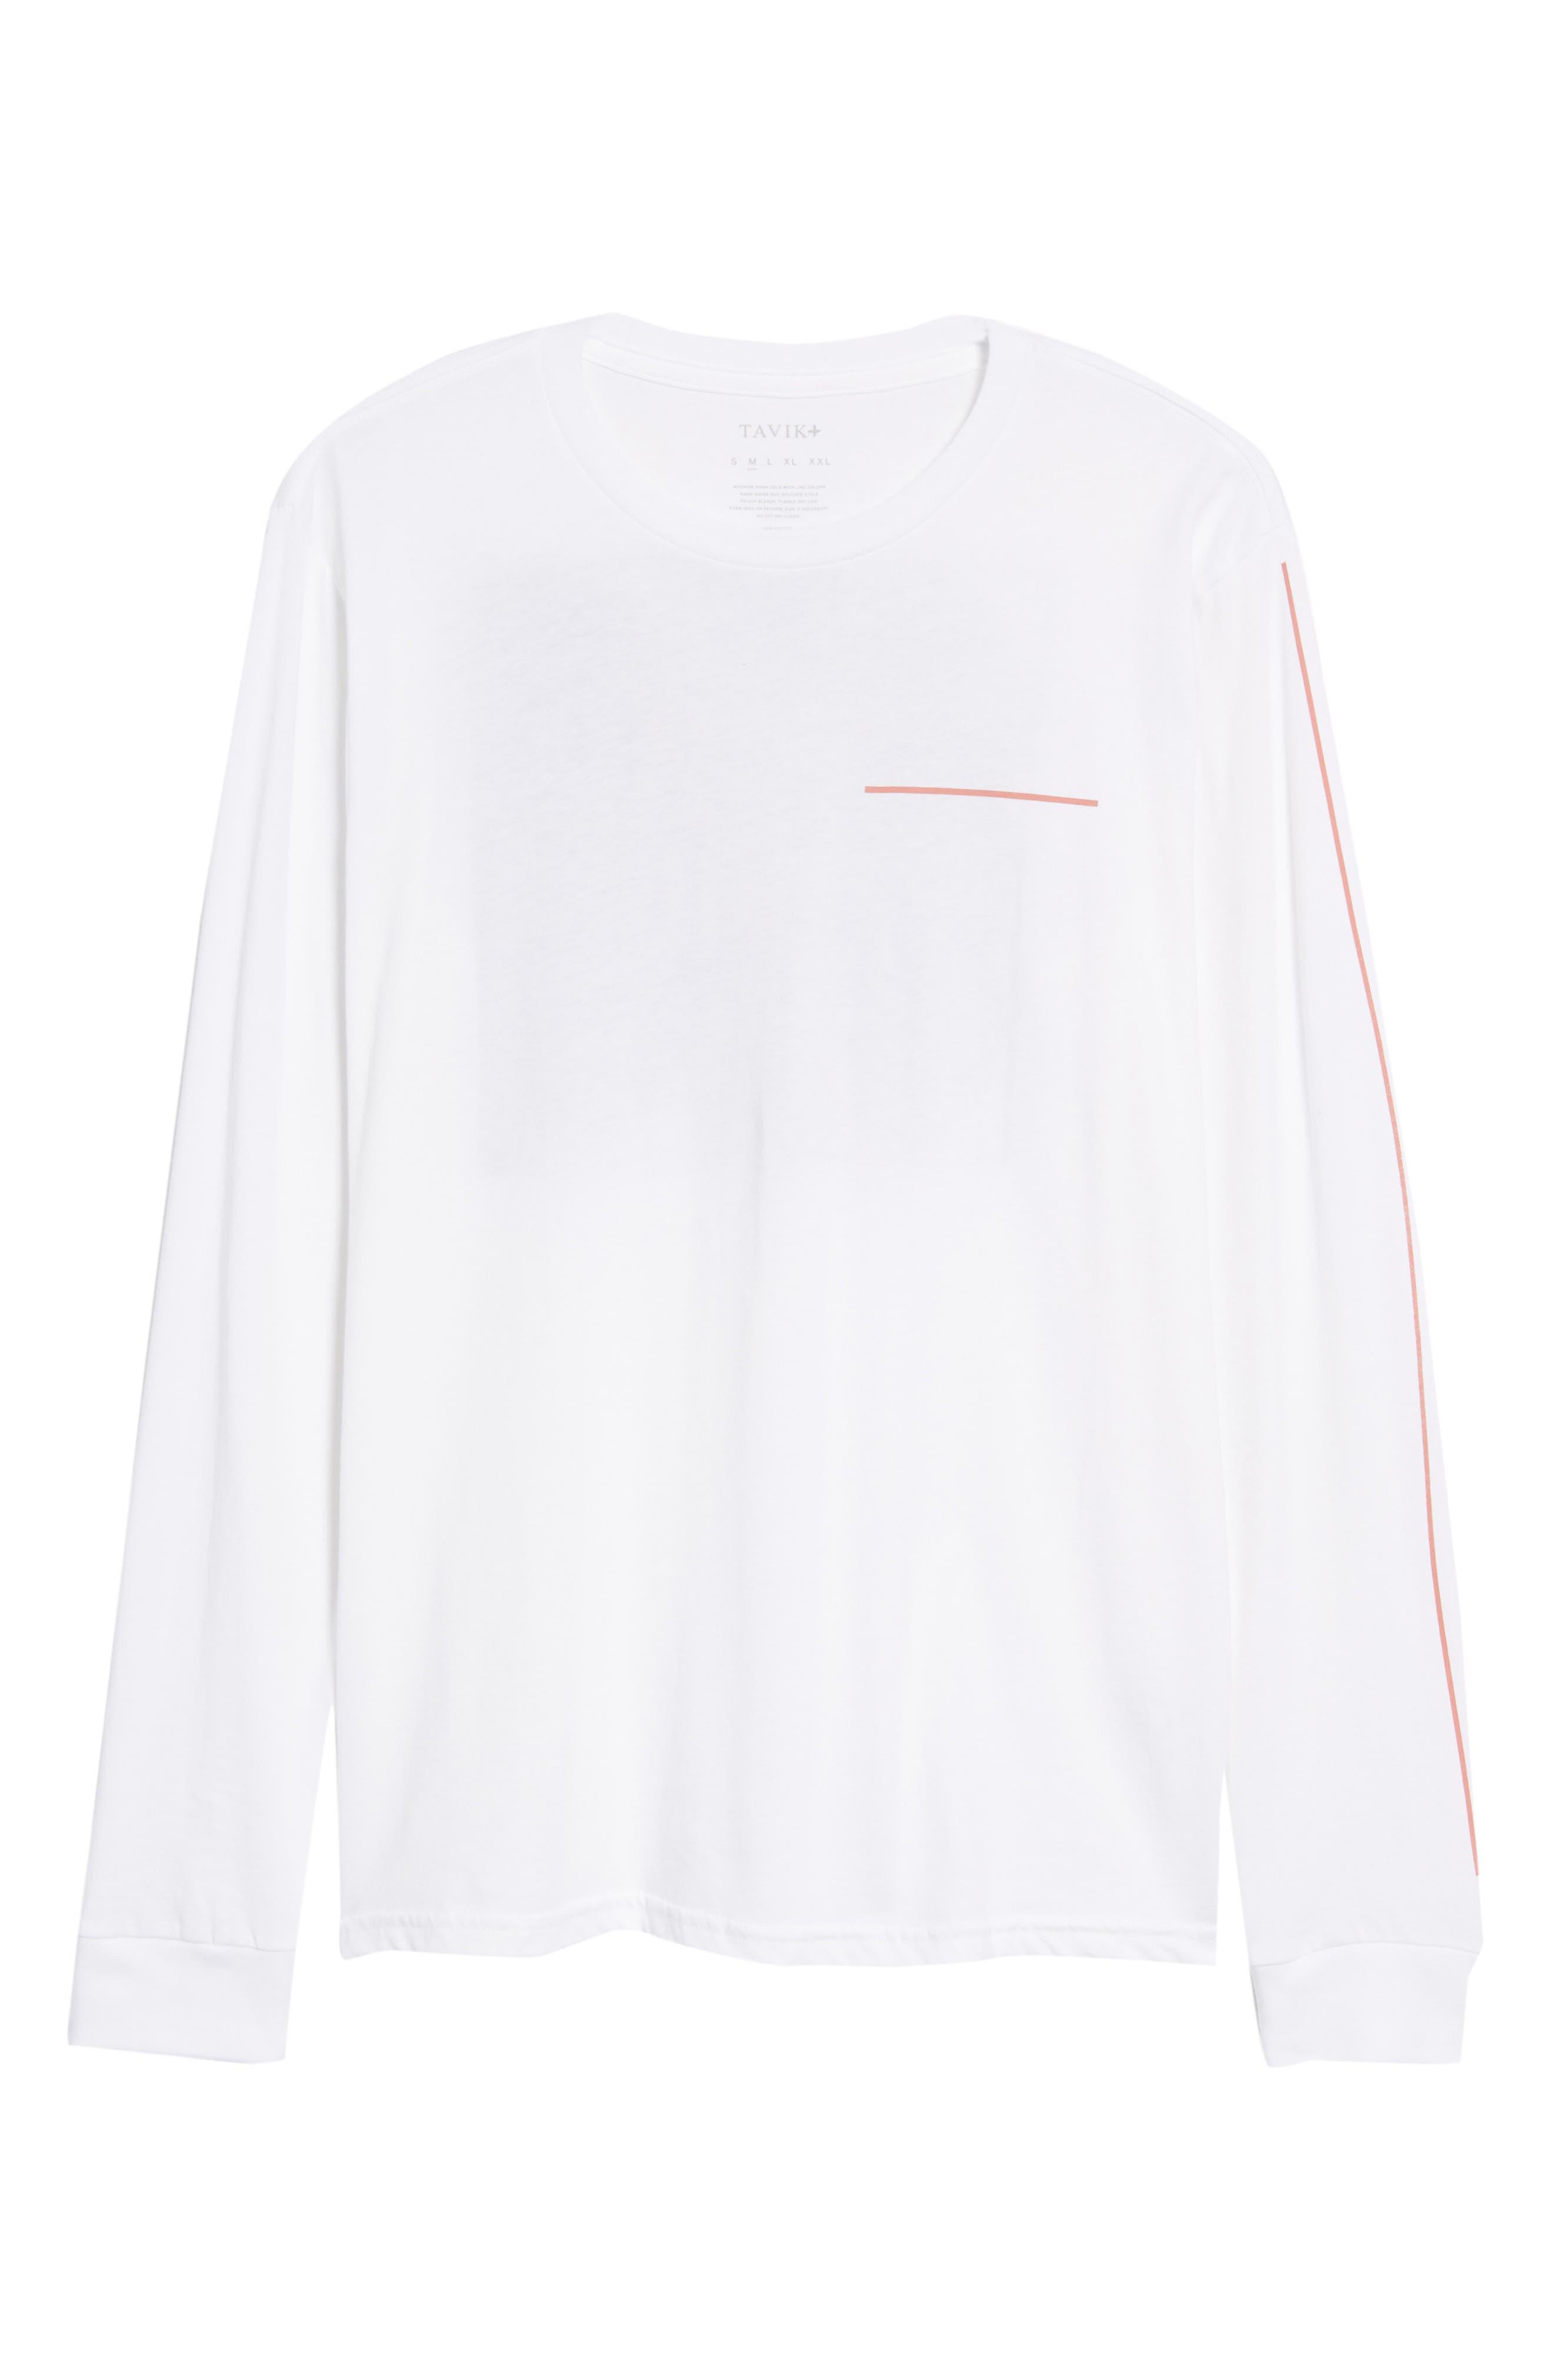 Soto Graphic T-Shirt,                             Alternate thumbnail 6, color,                             100